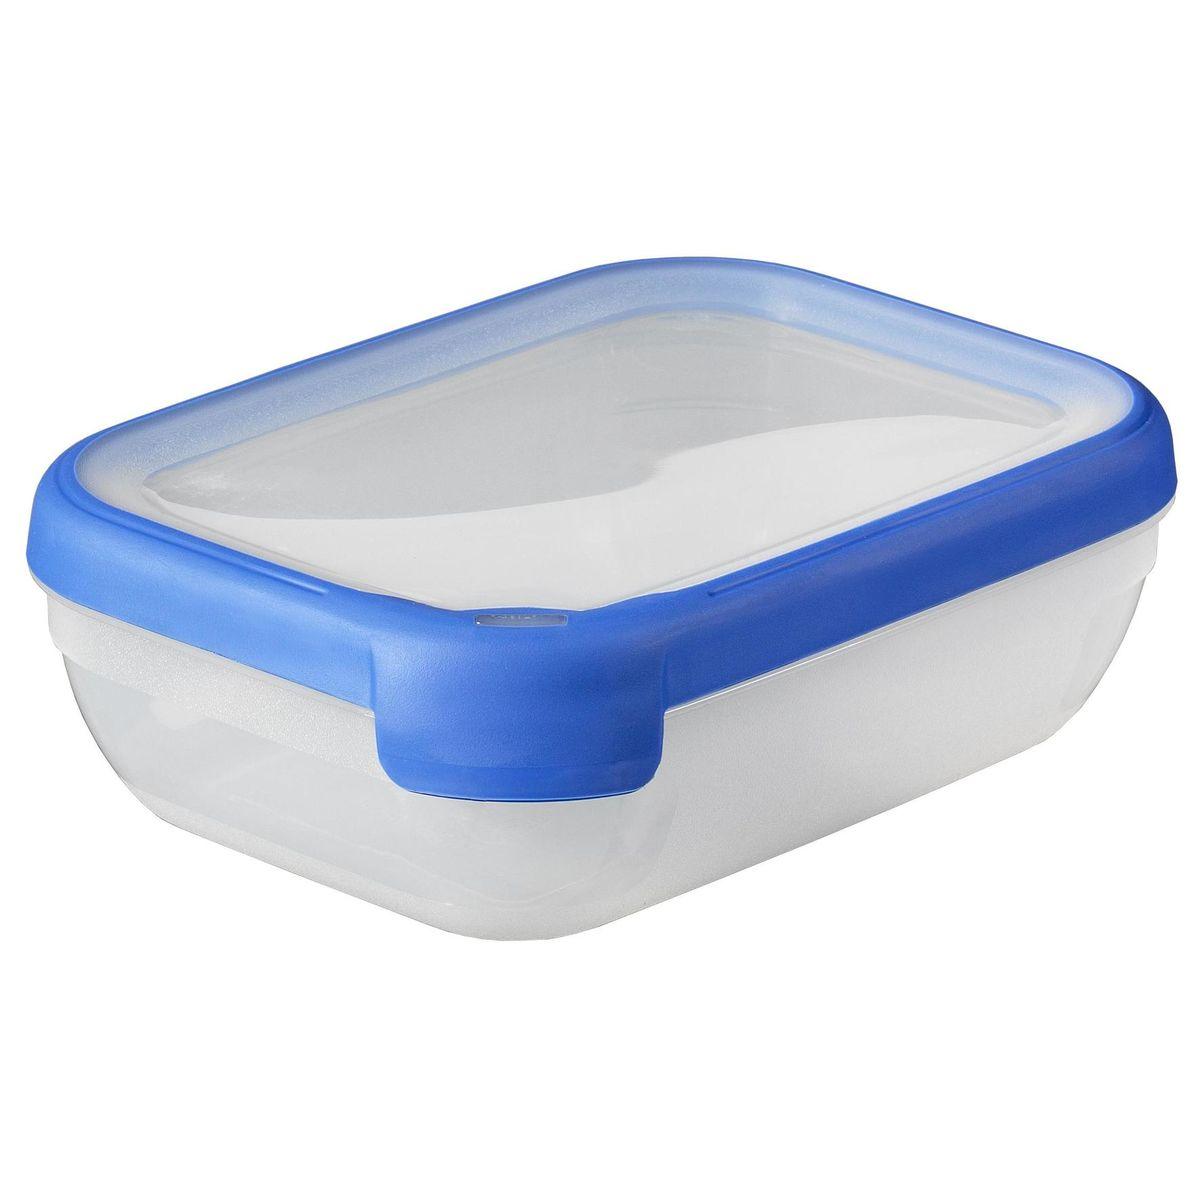 Curver Vershouddoos Grand Chef 1,8L - Transparant / Blauw